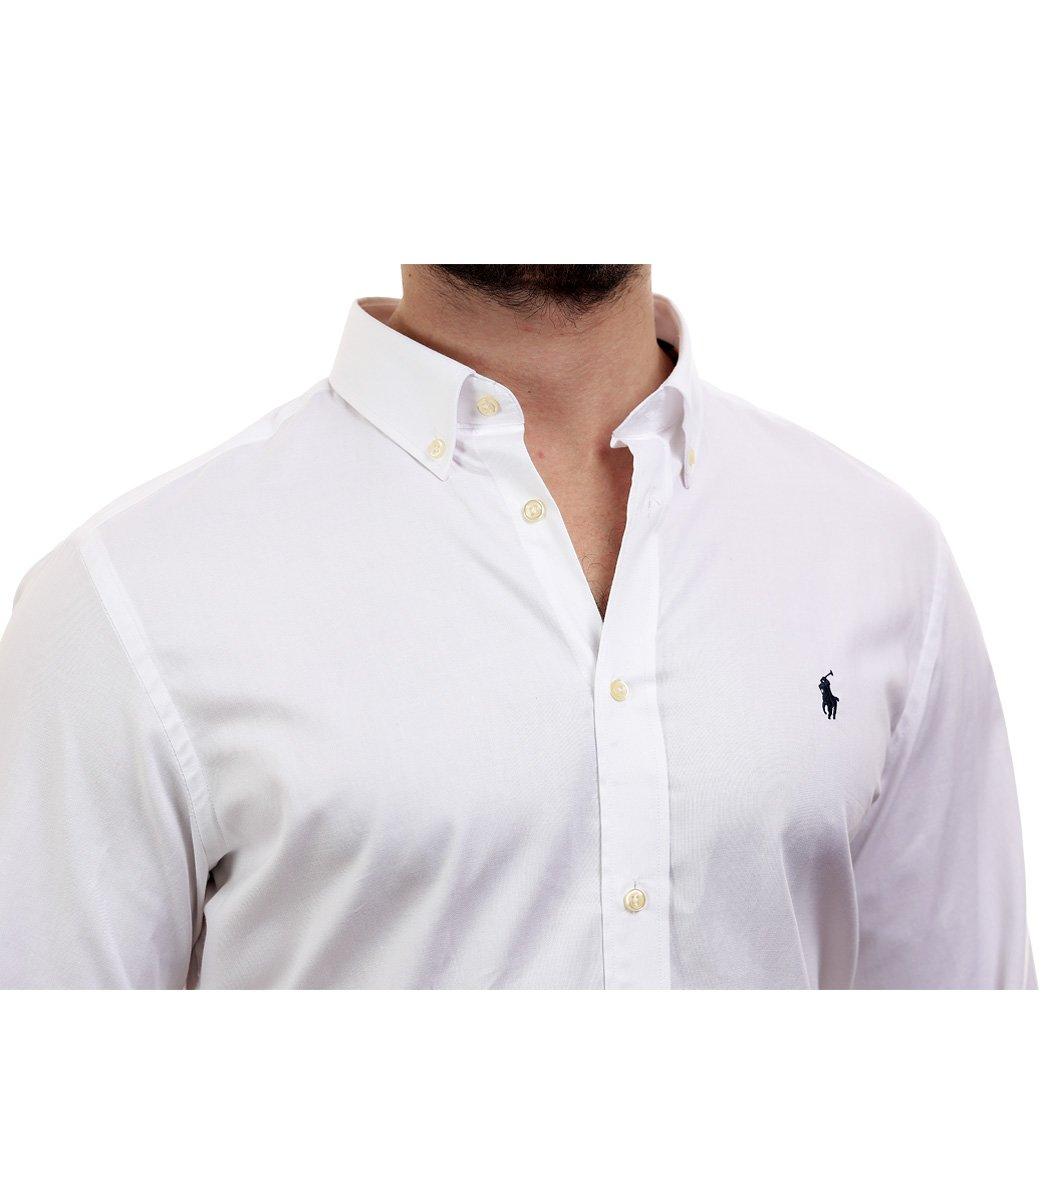 Белая рубашка POLO Ralph Lauren classic - Белый - Вид 4